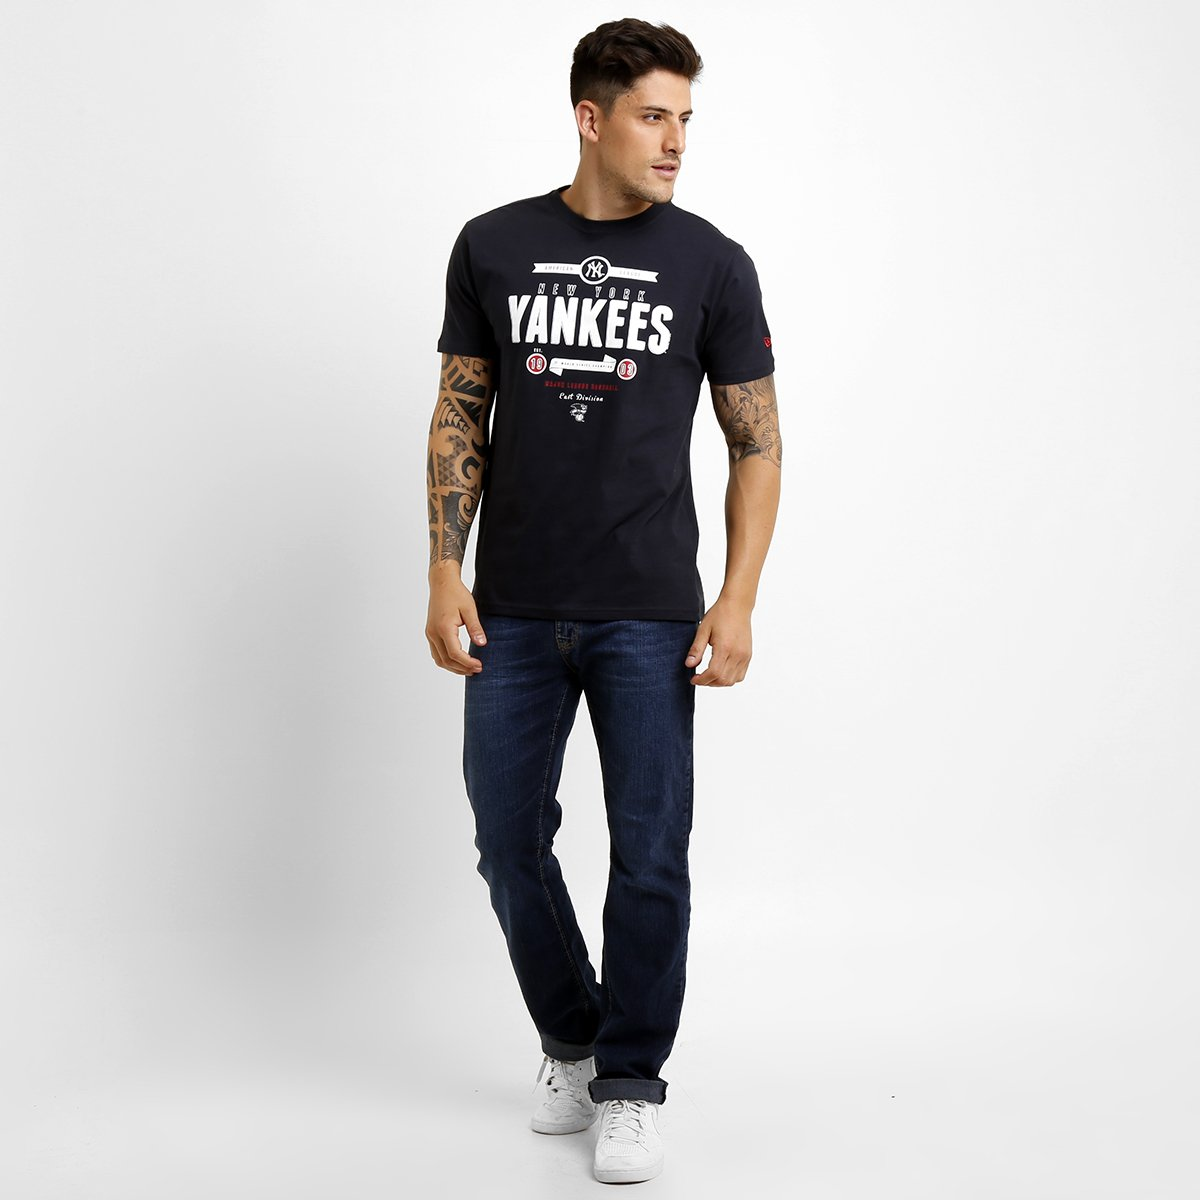 Camiseta New Era MLB Retro New York Yankees - Compre Agora  3ff437c7aa1